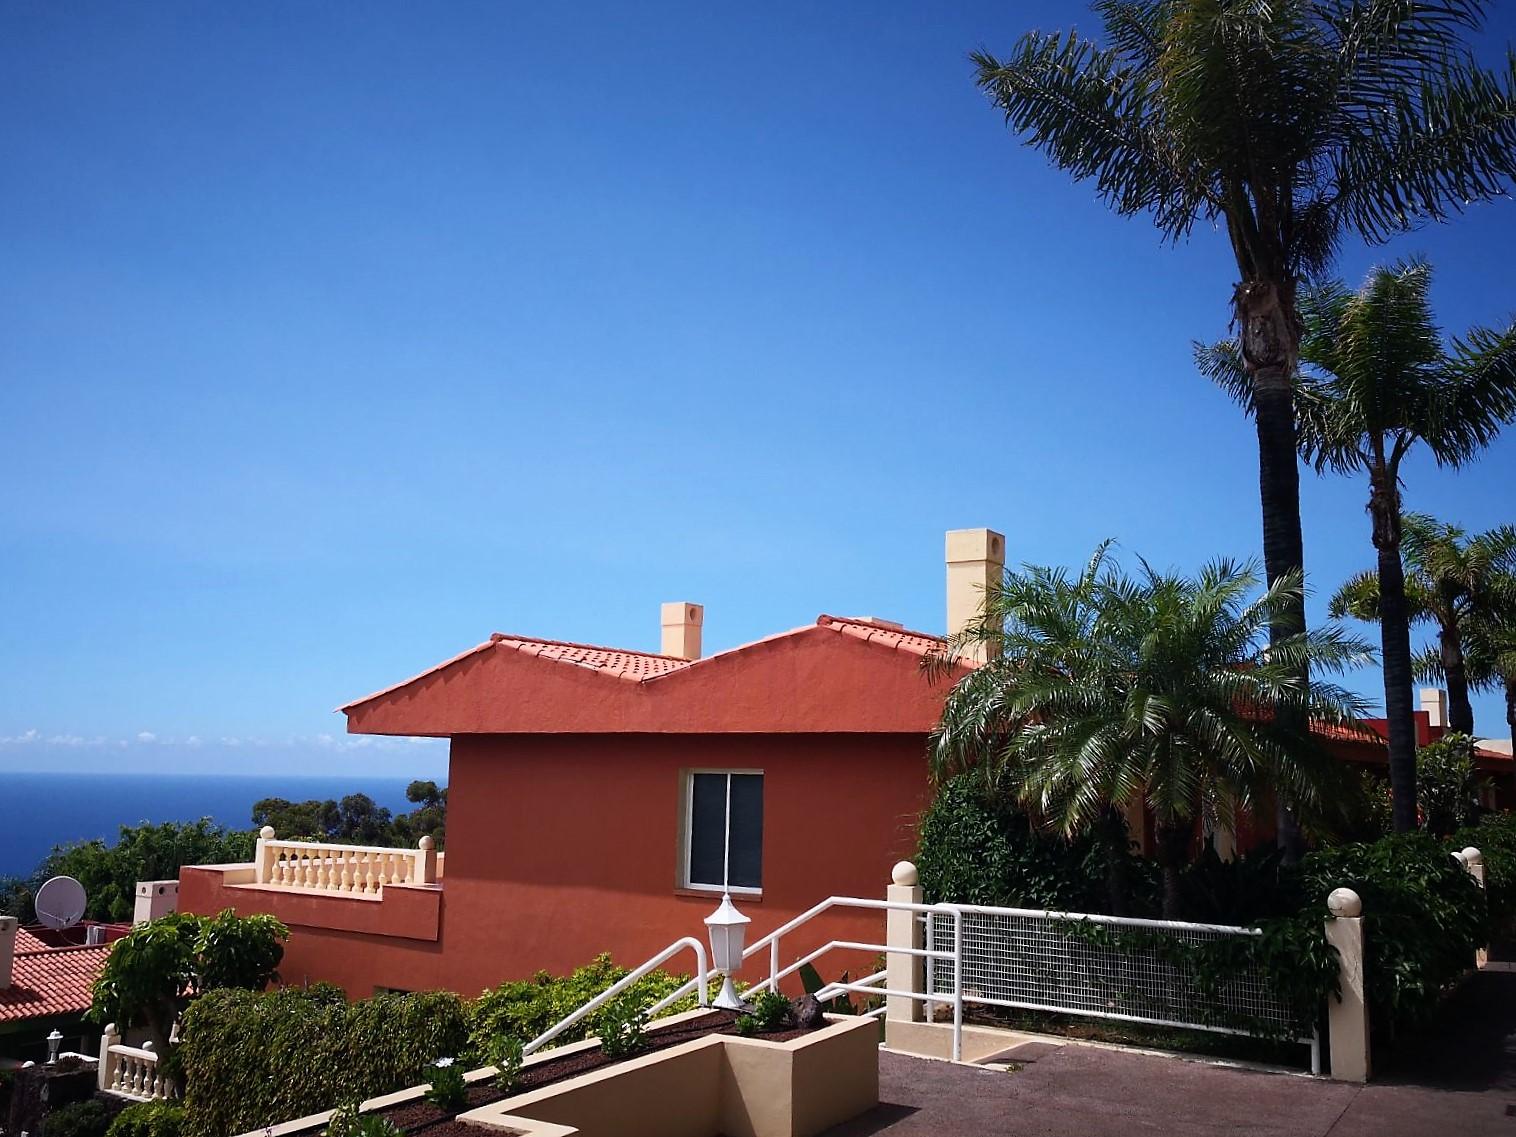 Ferienhaus Teneriffa Nord La Quinta Treppen Außenanlage